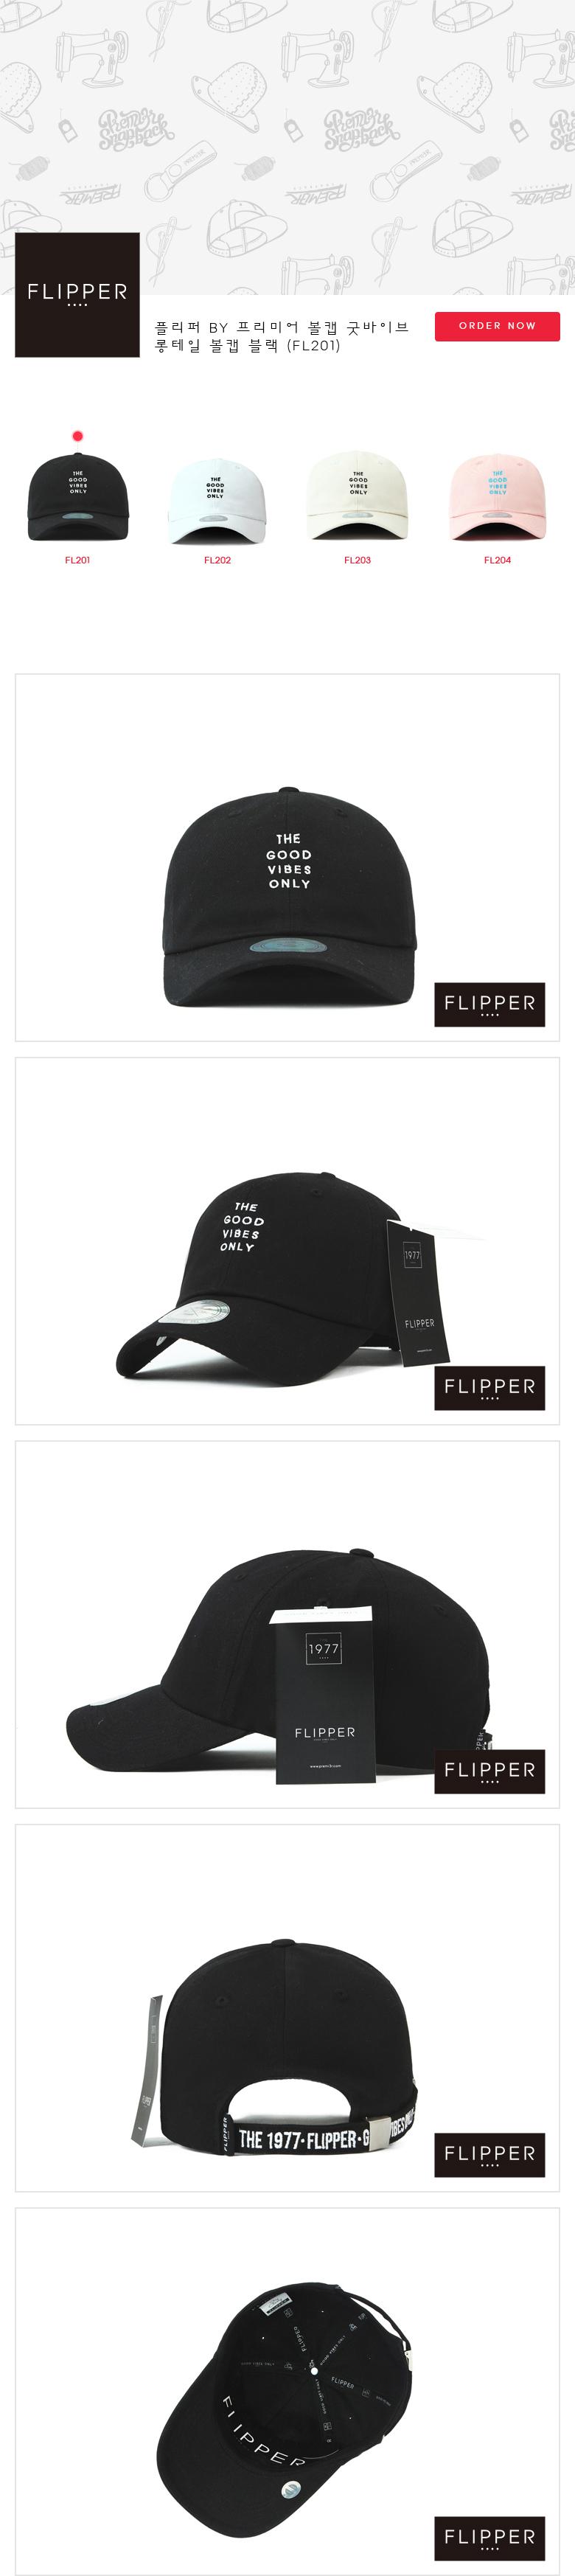 [ PREMIER ] [Premier] Flipper Ball Cap Good Vibes Long Tail Ball Cap Black (FL201)